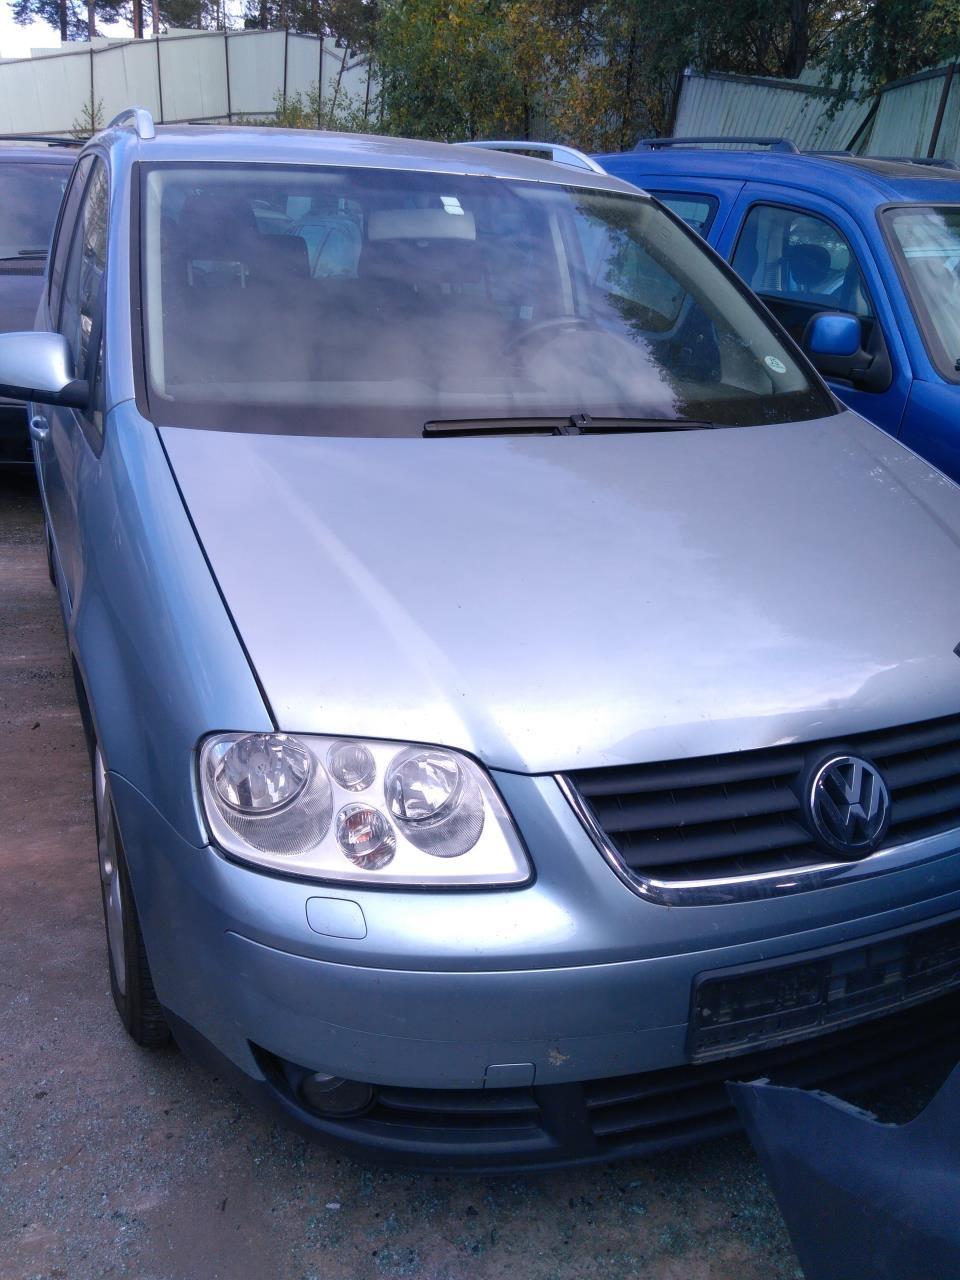 VW Touran 2003-2006 (Type I, Fase 1) delebil